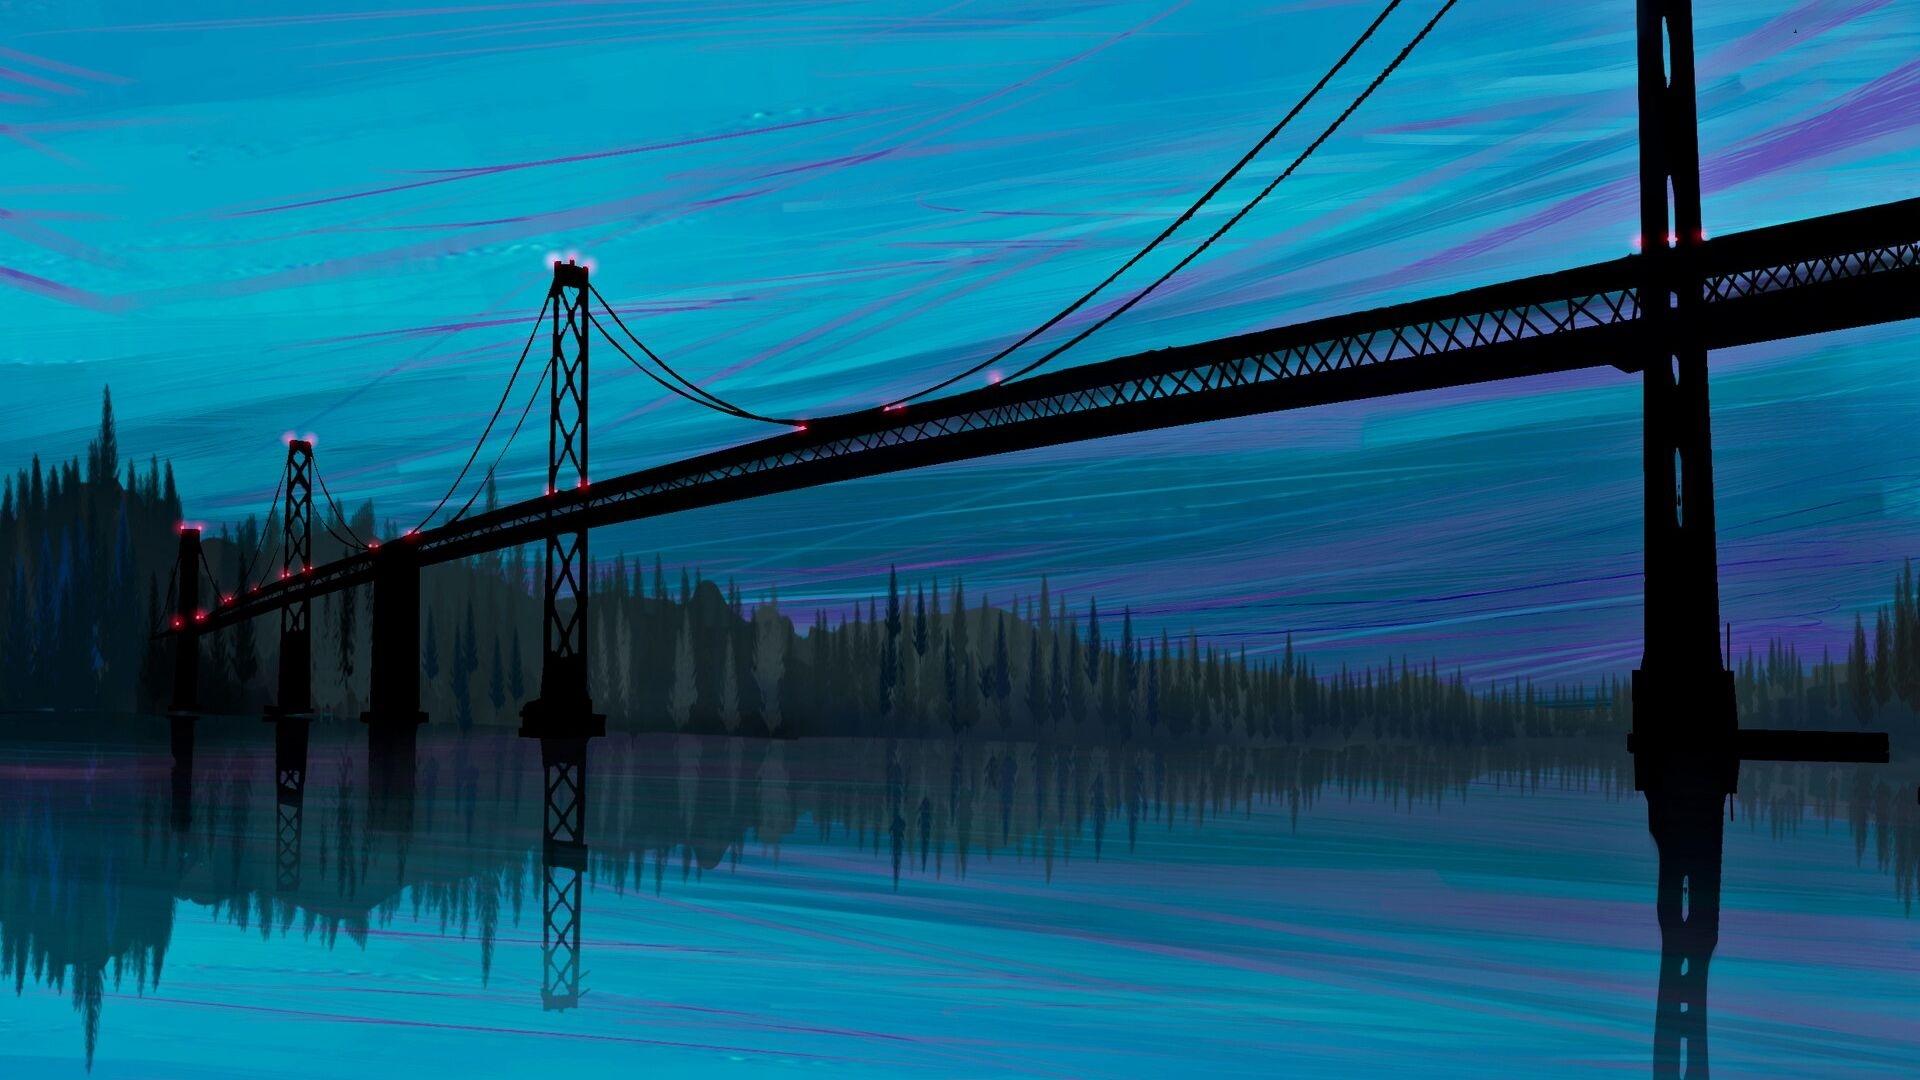 Bridge Art desktop wallpaper hd